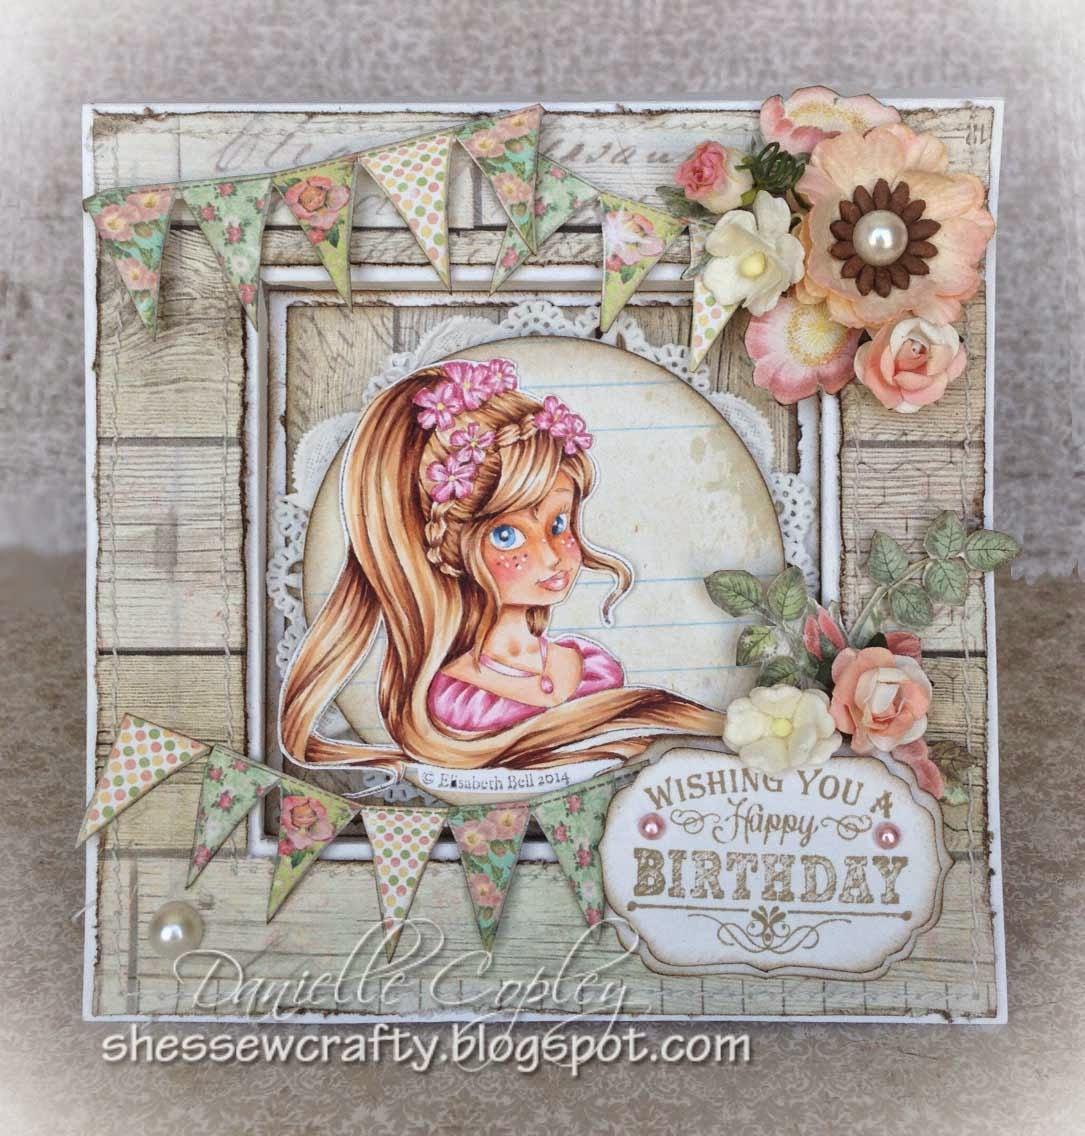 Whimsy's Elizabeth Bell's Miss Chloe Vignette using Prima's Fairy Rhymes paper